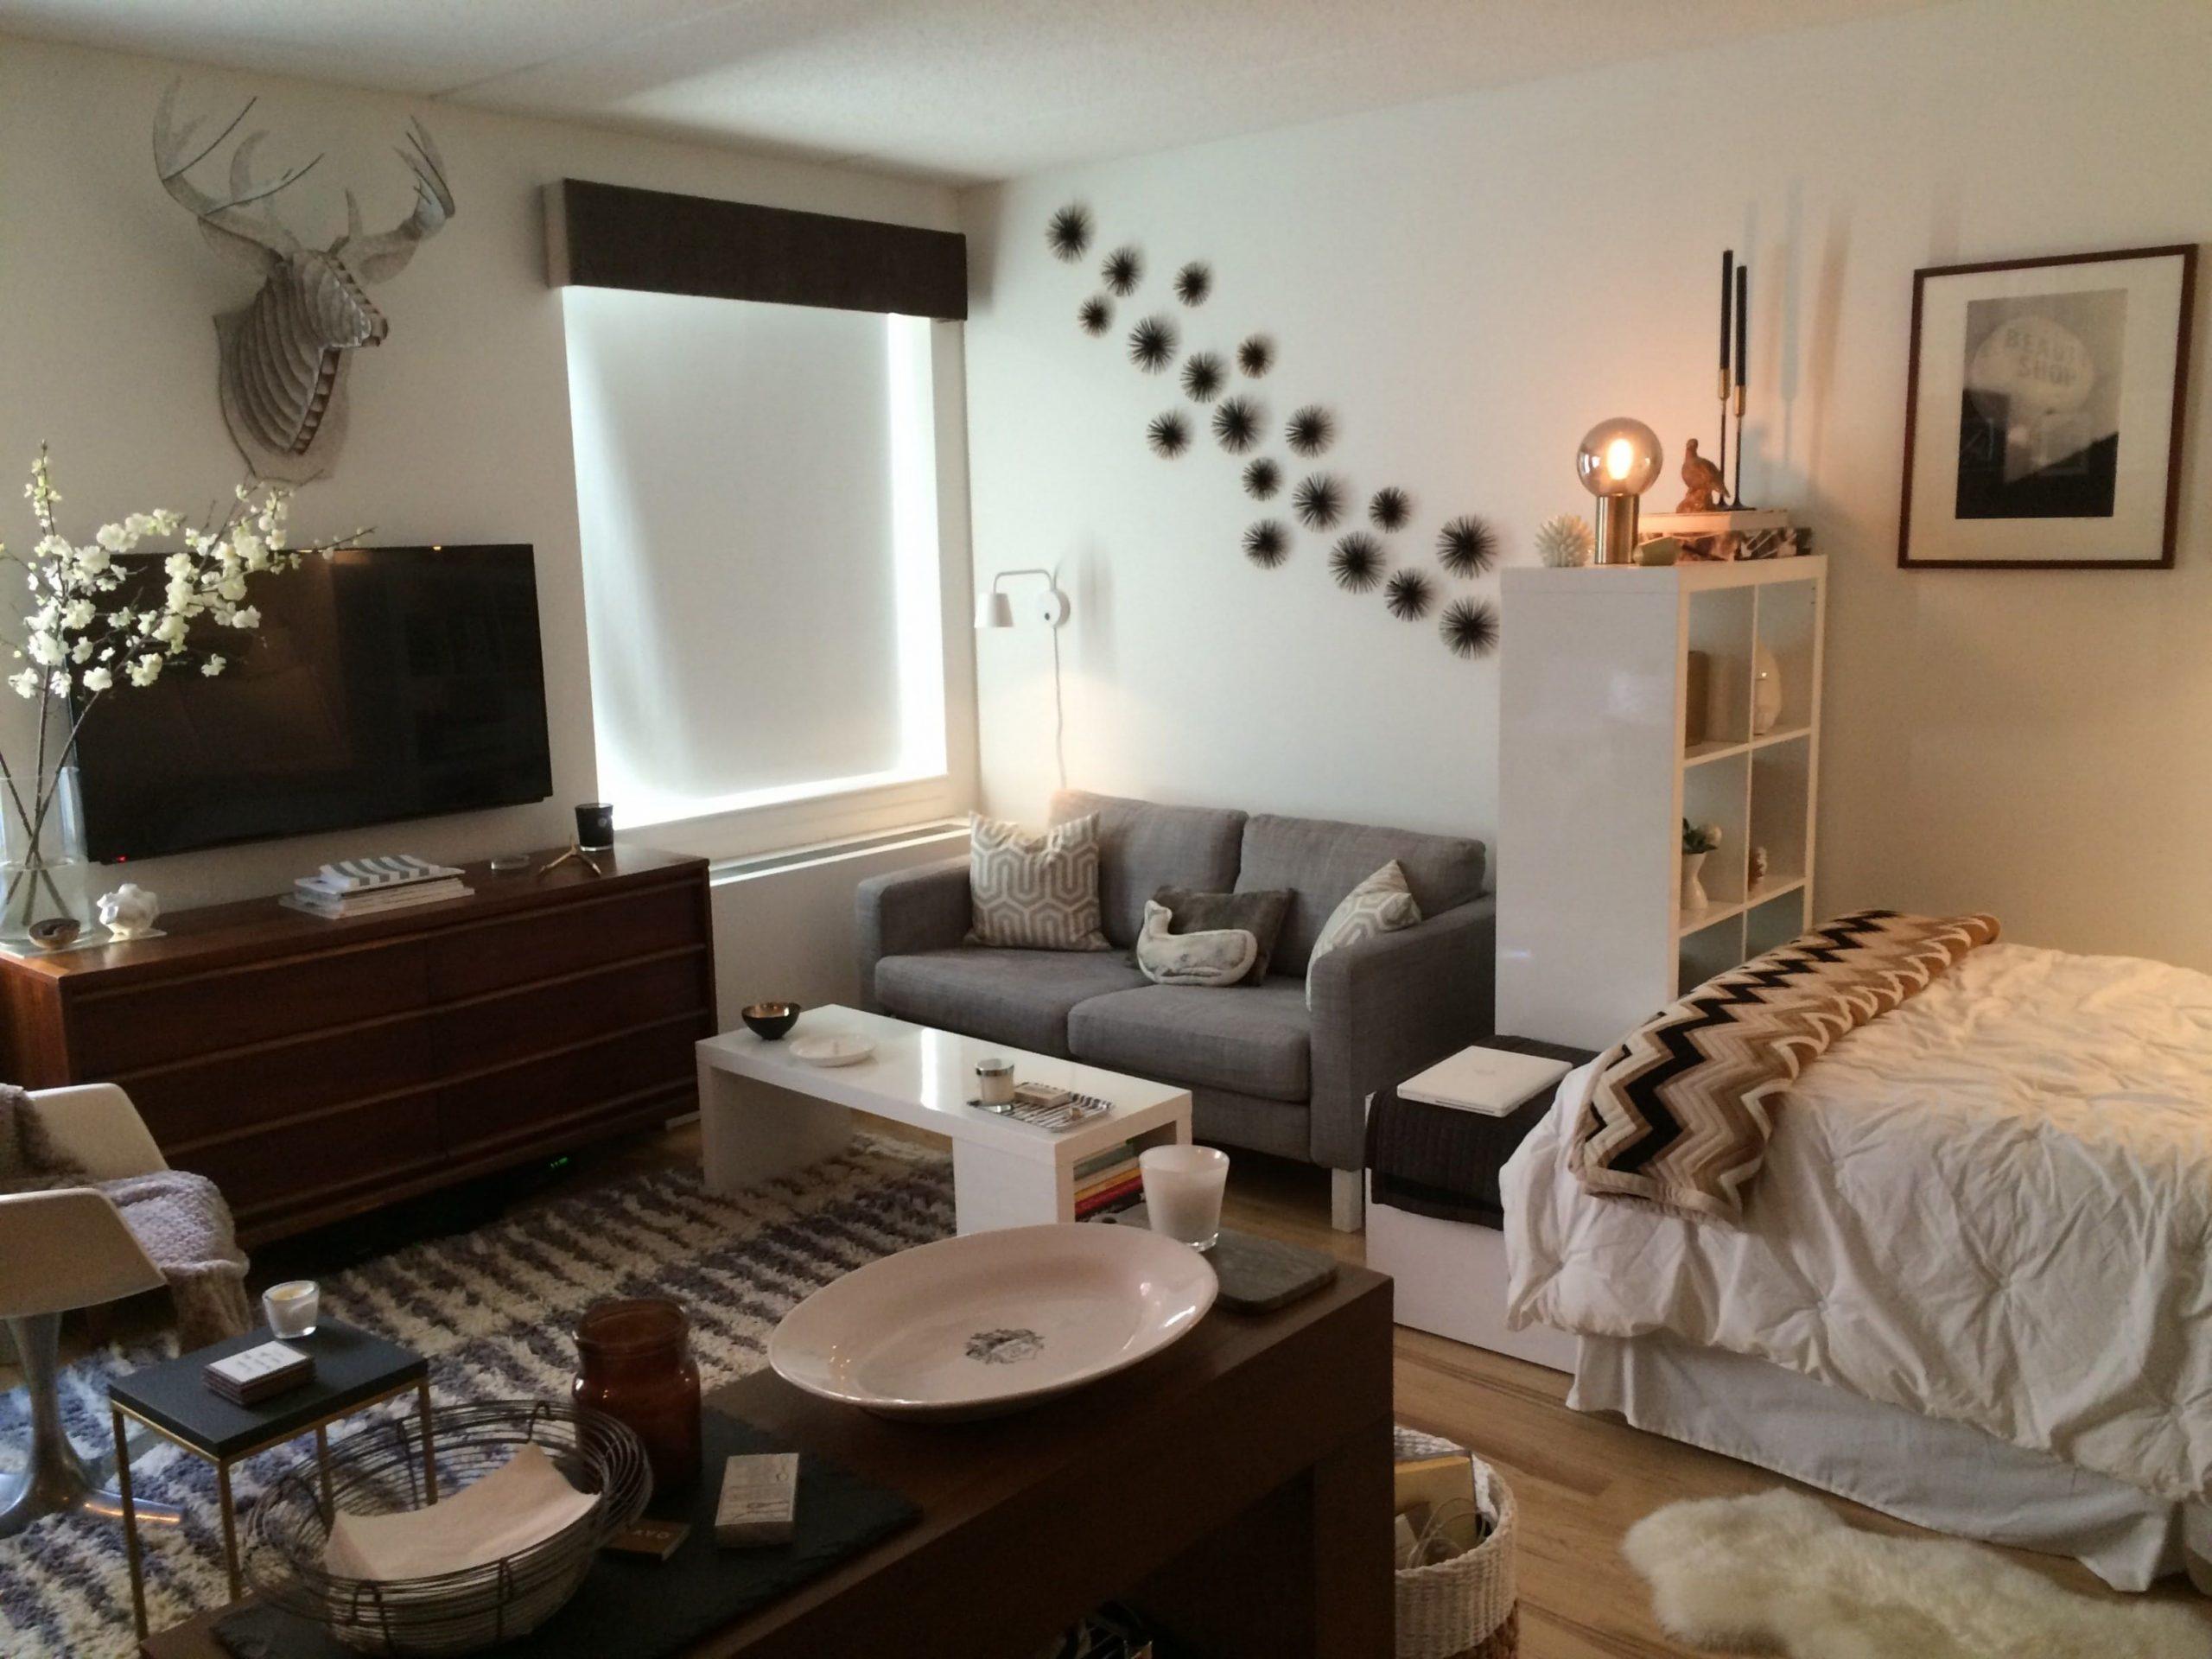 8 Studio Apartment Layouts That Just Plain Work  Apartment layout  - One Room Apartment Decor Ideas